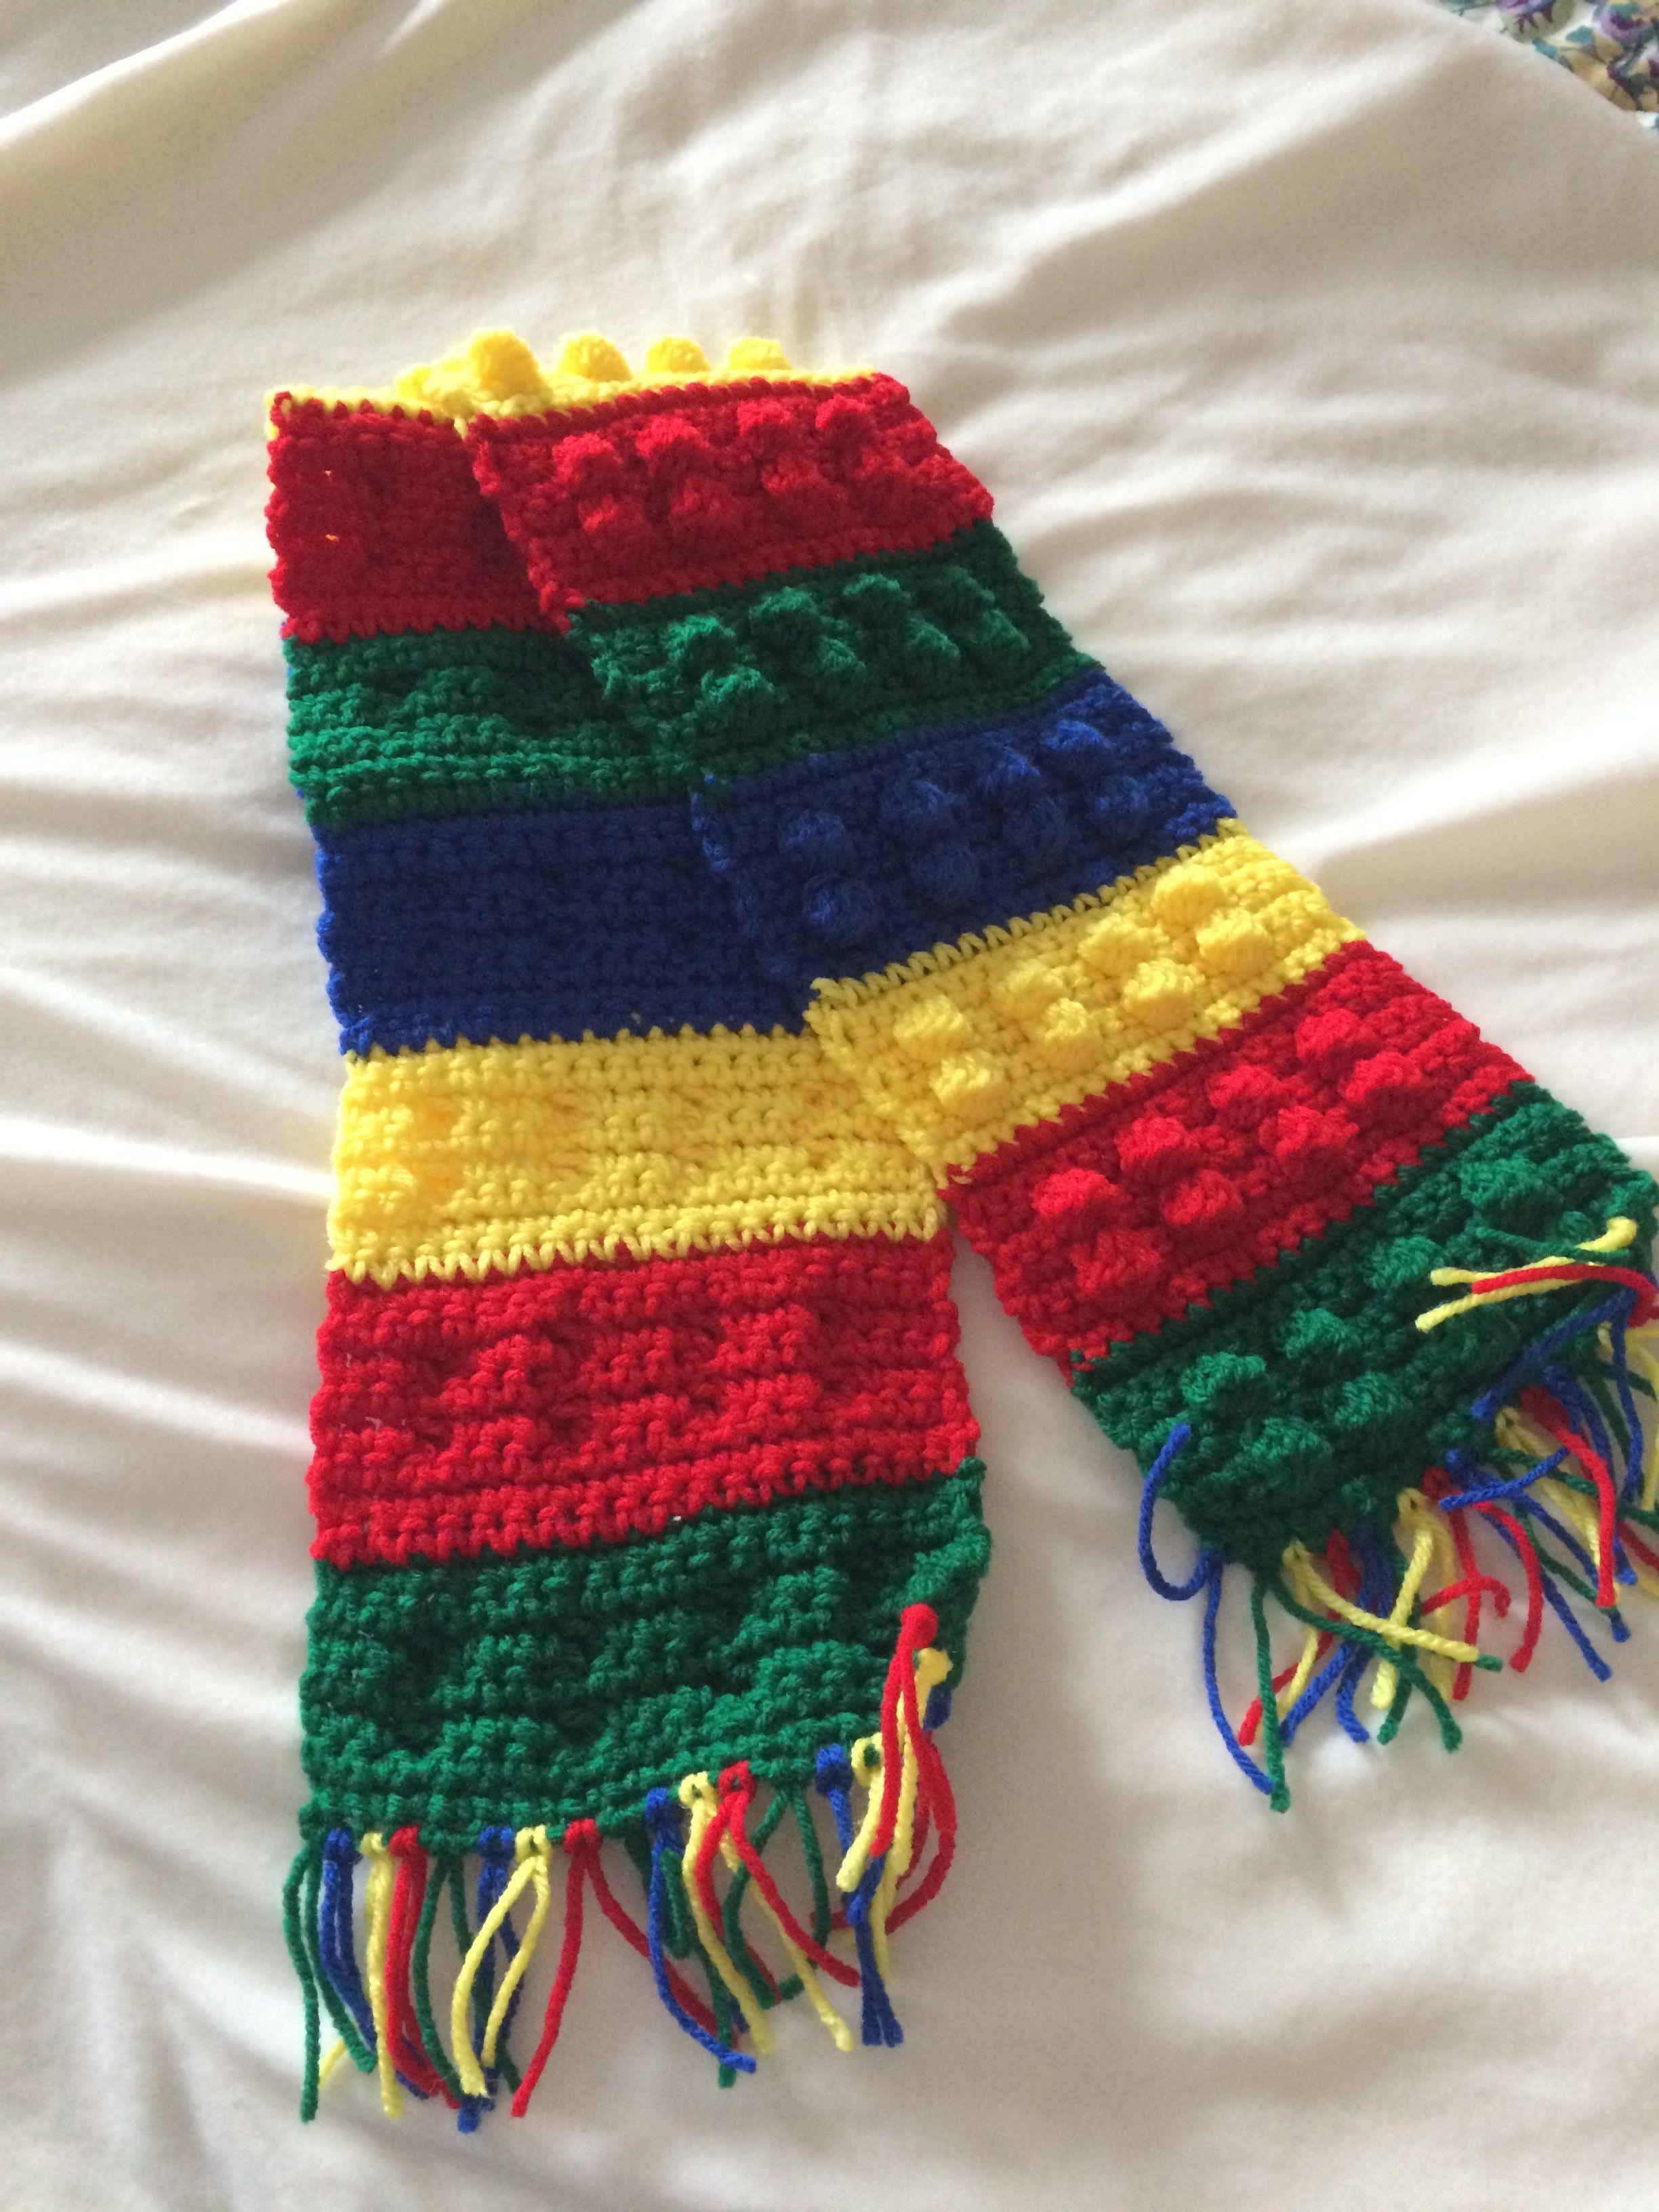 Lego scarf-crochet, popcorn stitch   Things I Have Made   Pinterest ...